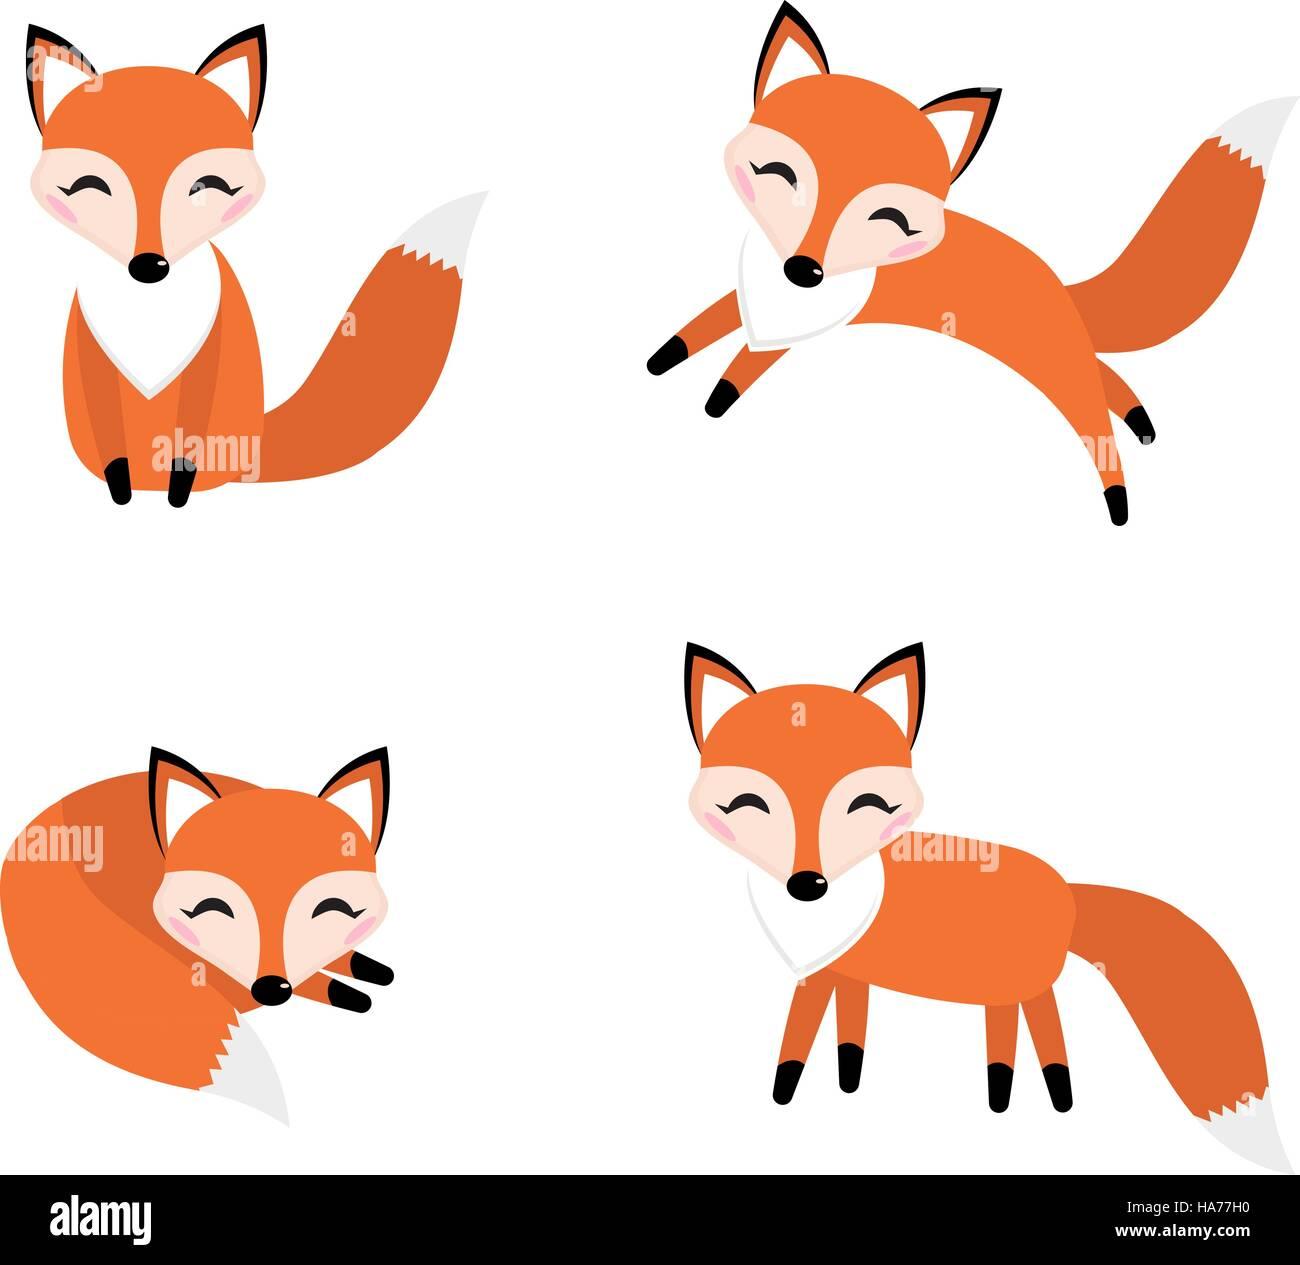 3 manières de dessiner un renard - wikiHow